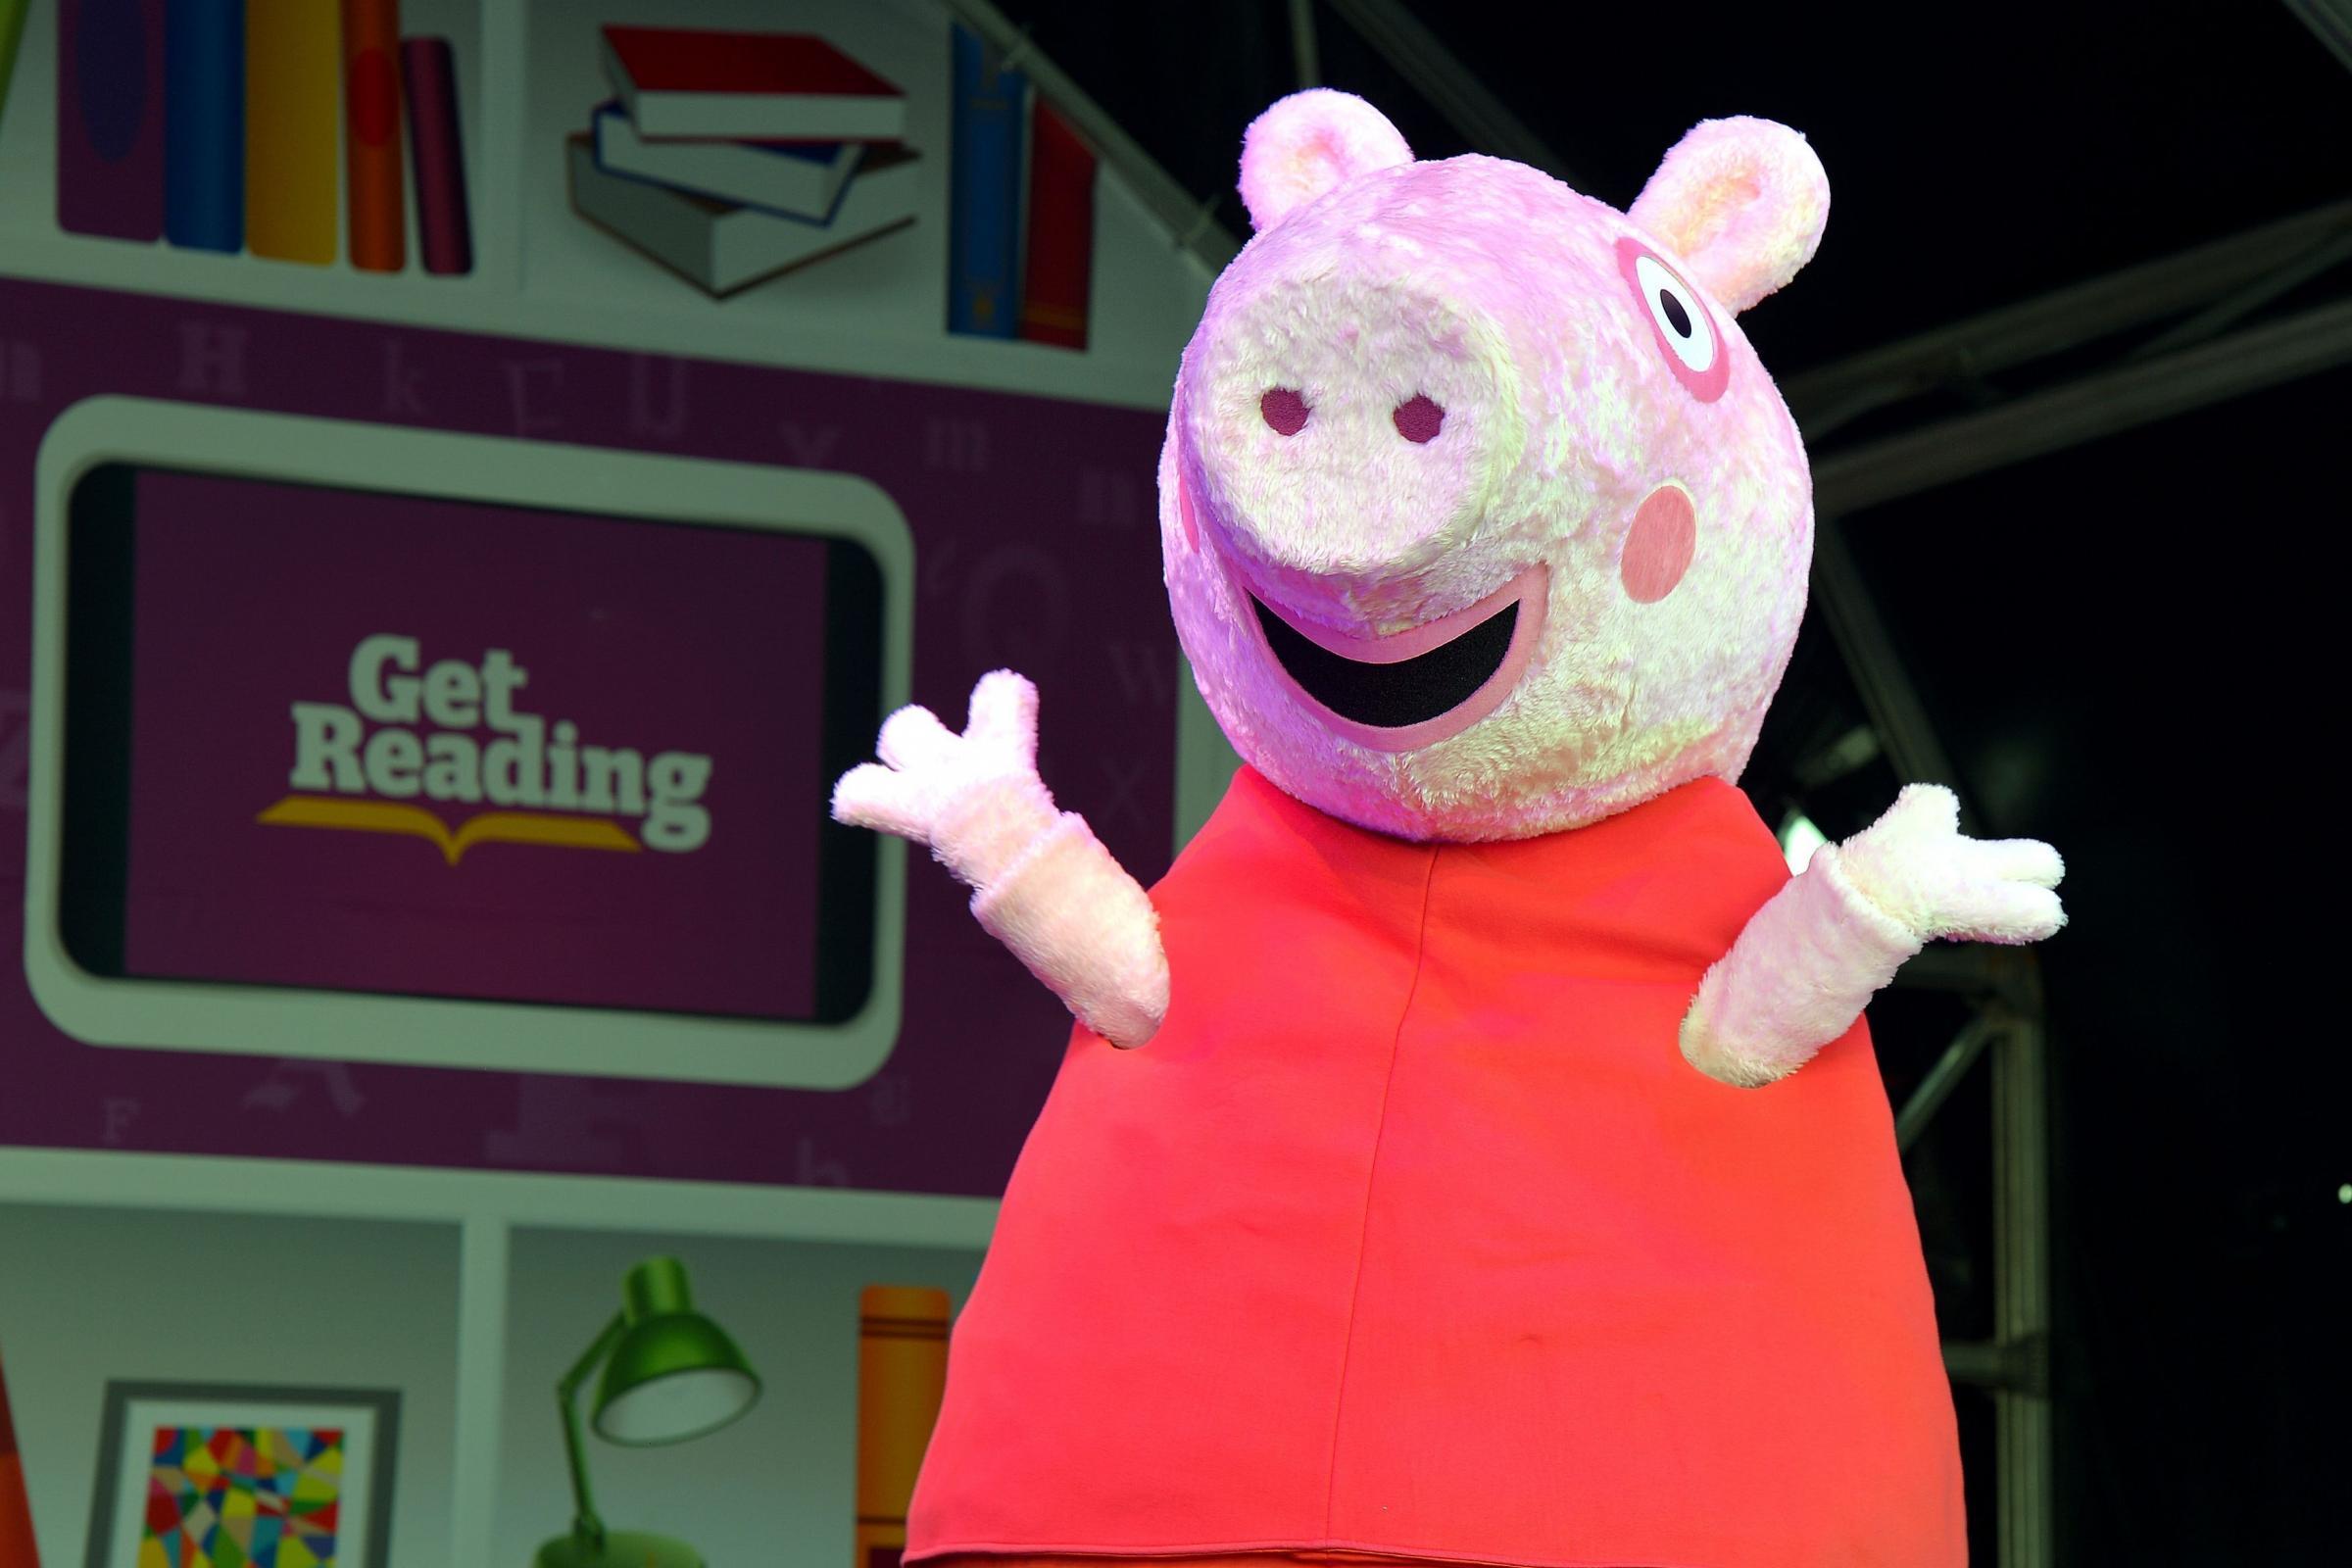 Home of Peppa Pig World named best amusement park again